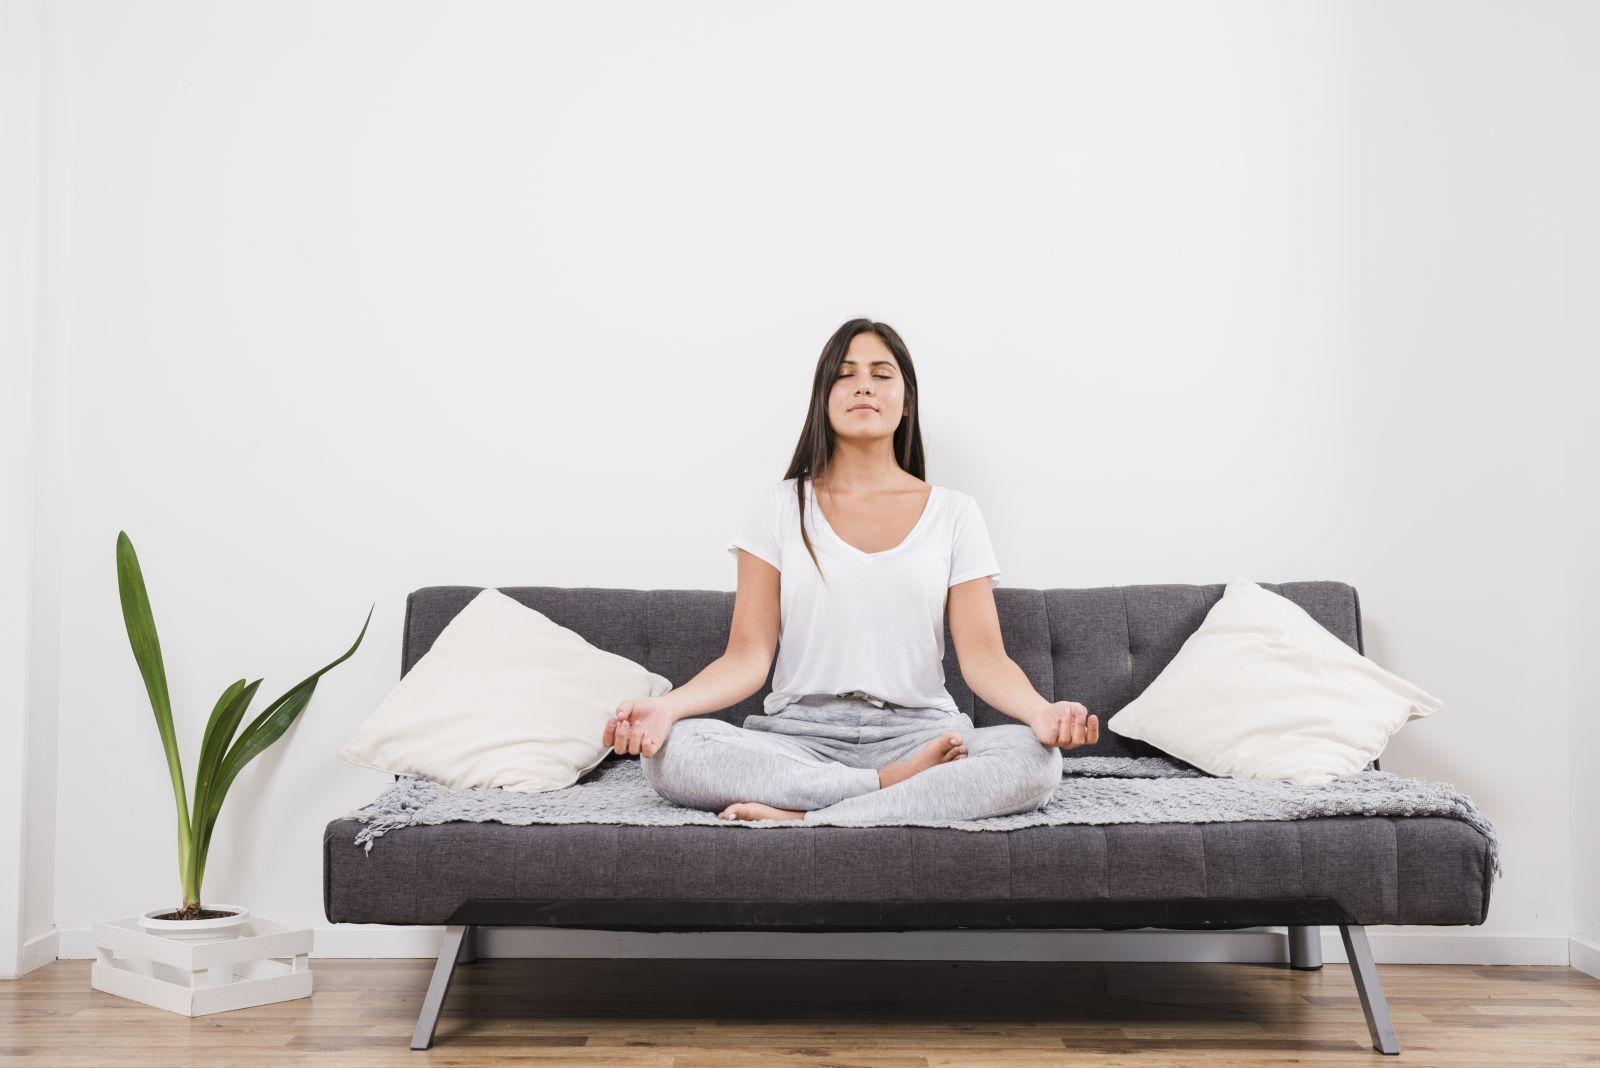 Tácticas para combatir el estrés